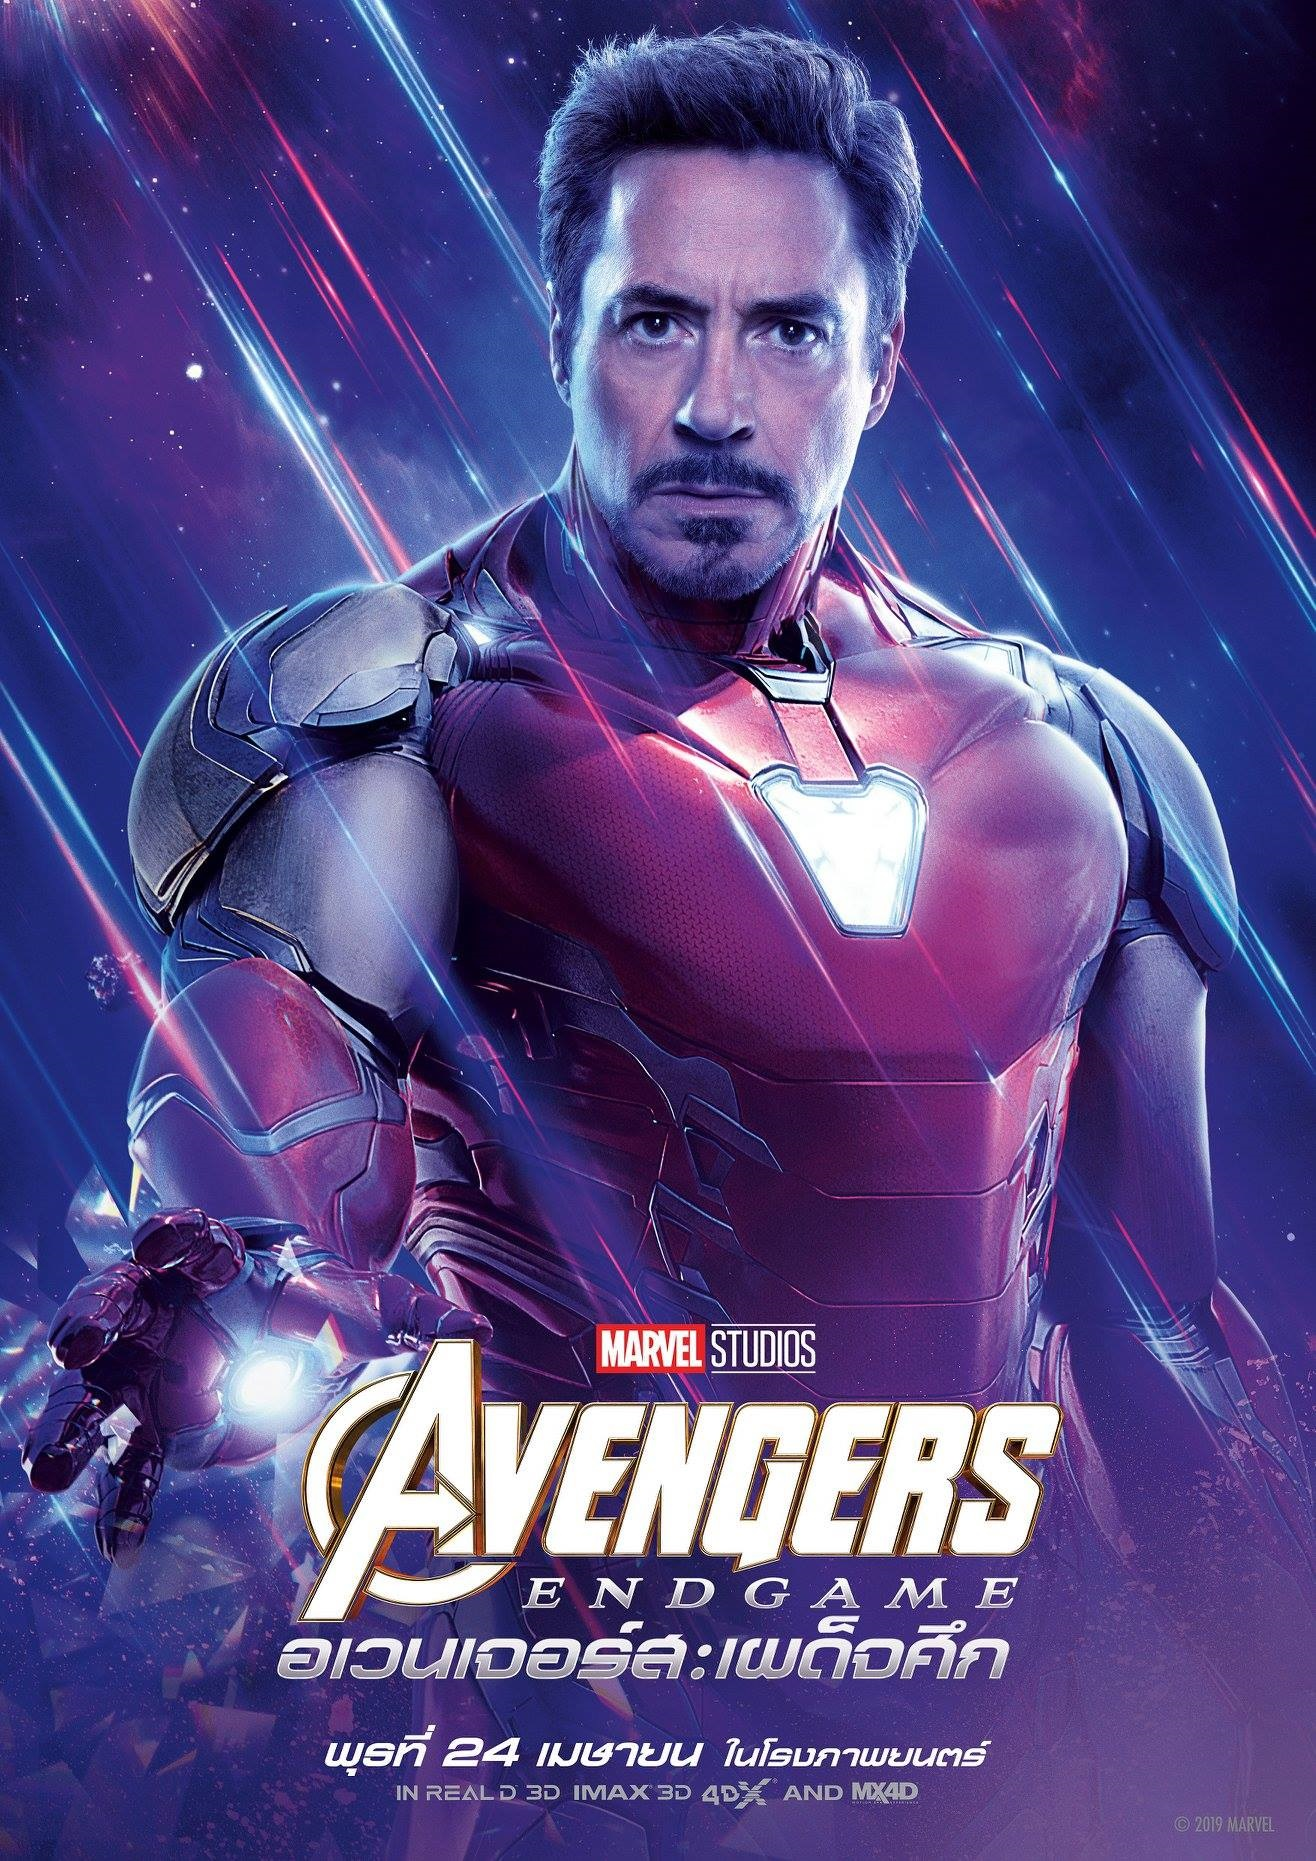 Endgame international character poster for Iron Man